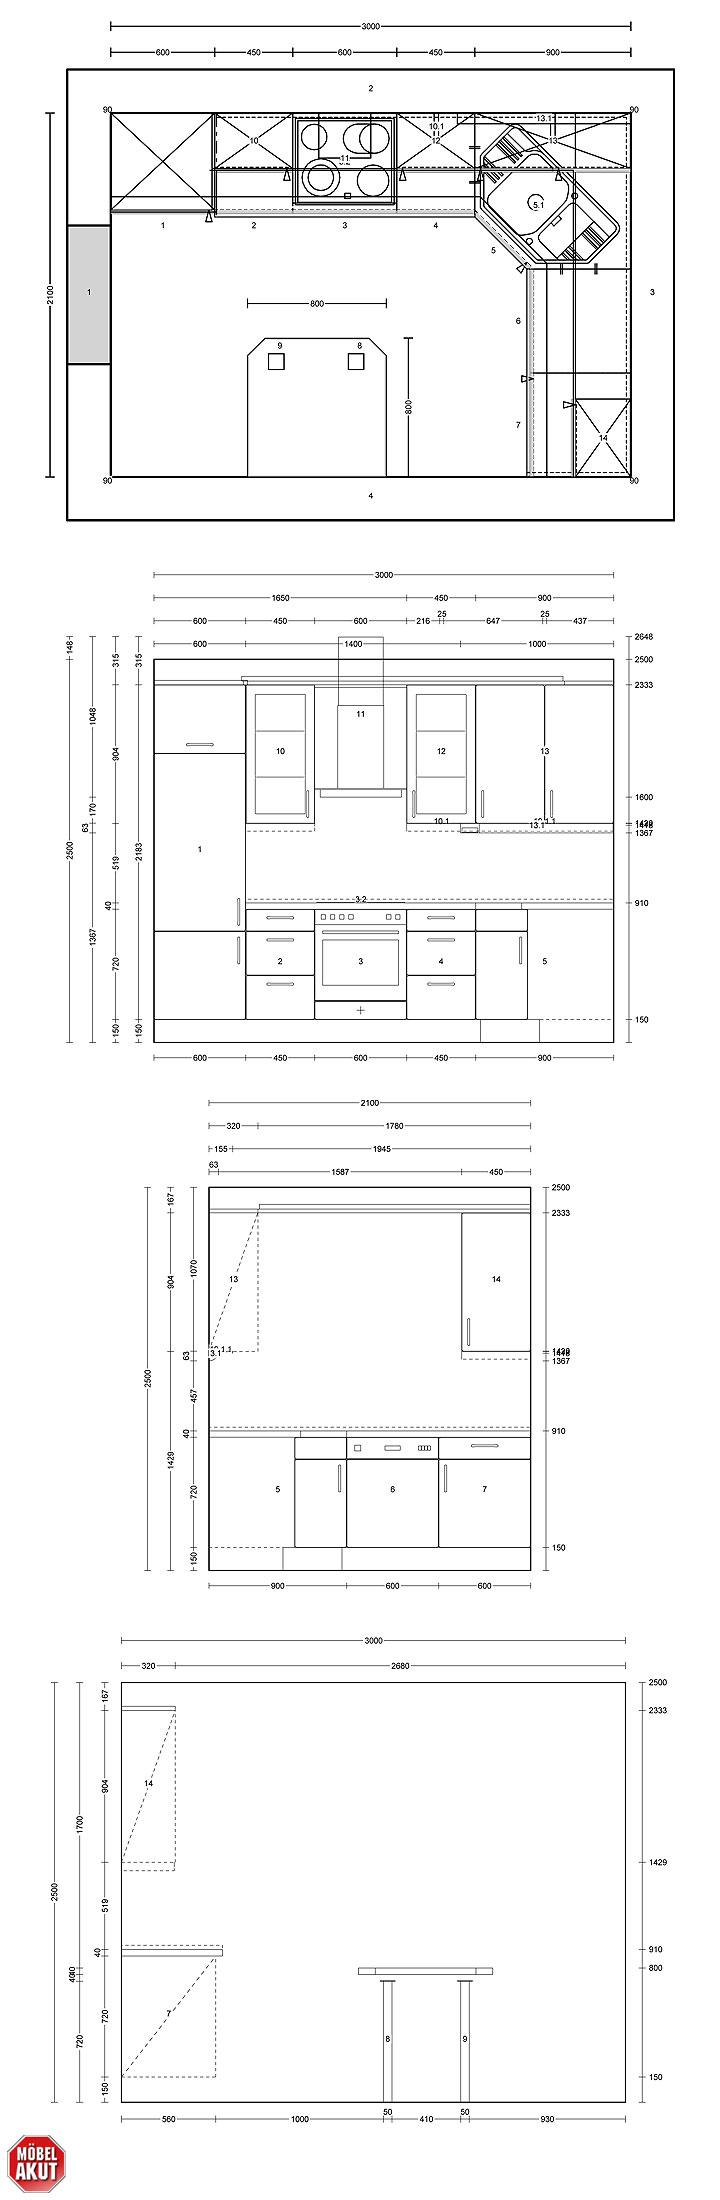 Maße Küchenblock jonpeeler info arbeitsplatte kuche maße design haus layout das